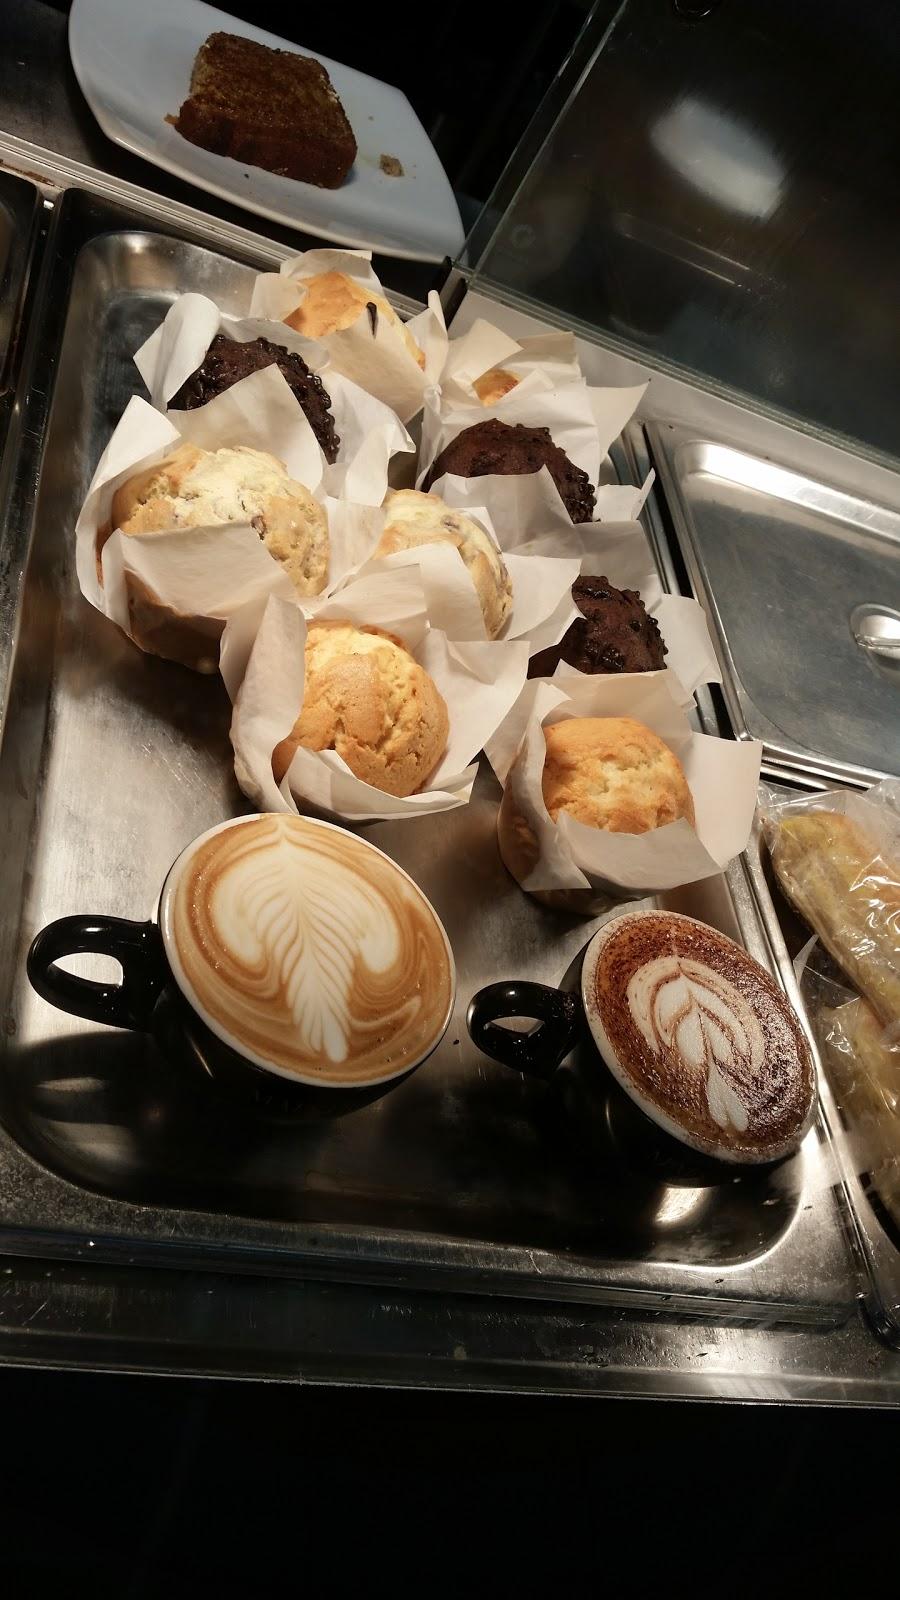 Mckeachies Corner Cafe | cafe | 8 McKeachie Dr, Aberglasslyn NSW 2320, Australia | 0249376696 OR +61 2 4937 6696